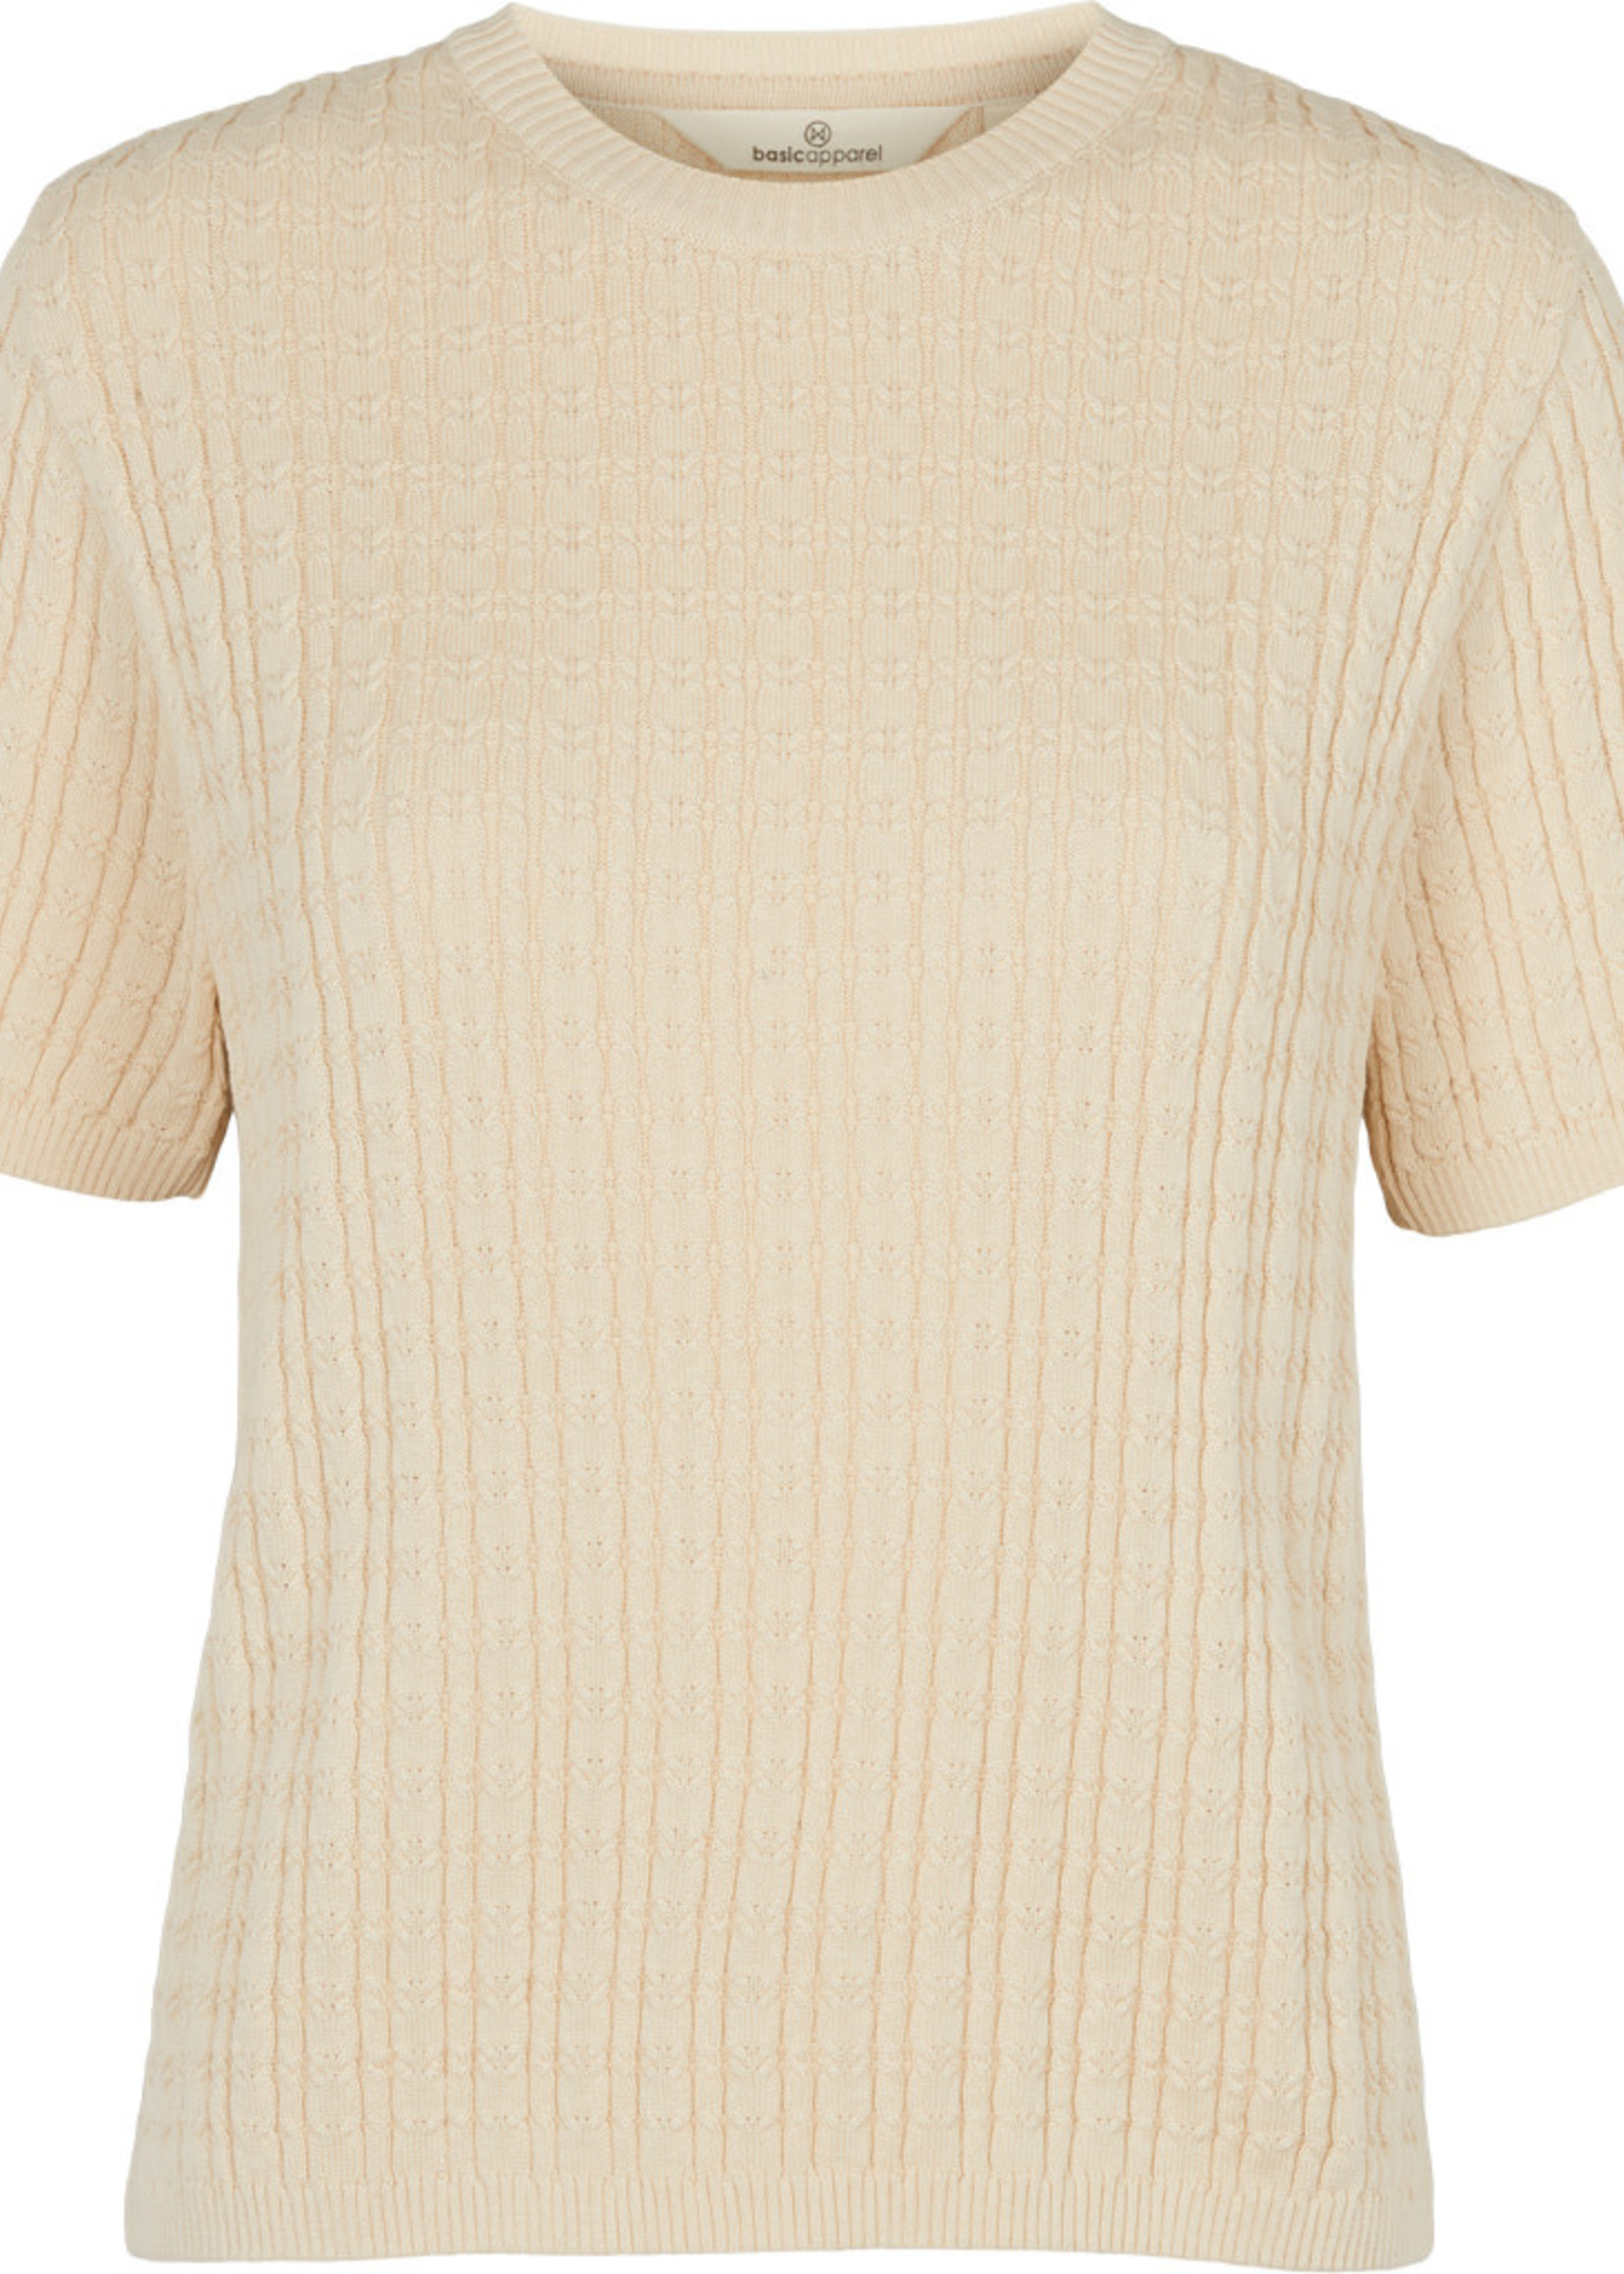 Basic Apparel Aline Sweater (short sleeved)